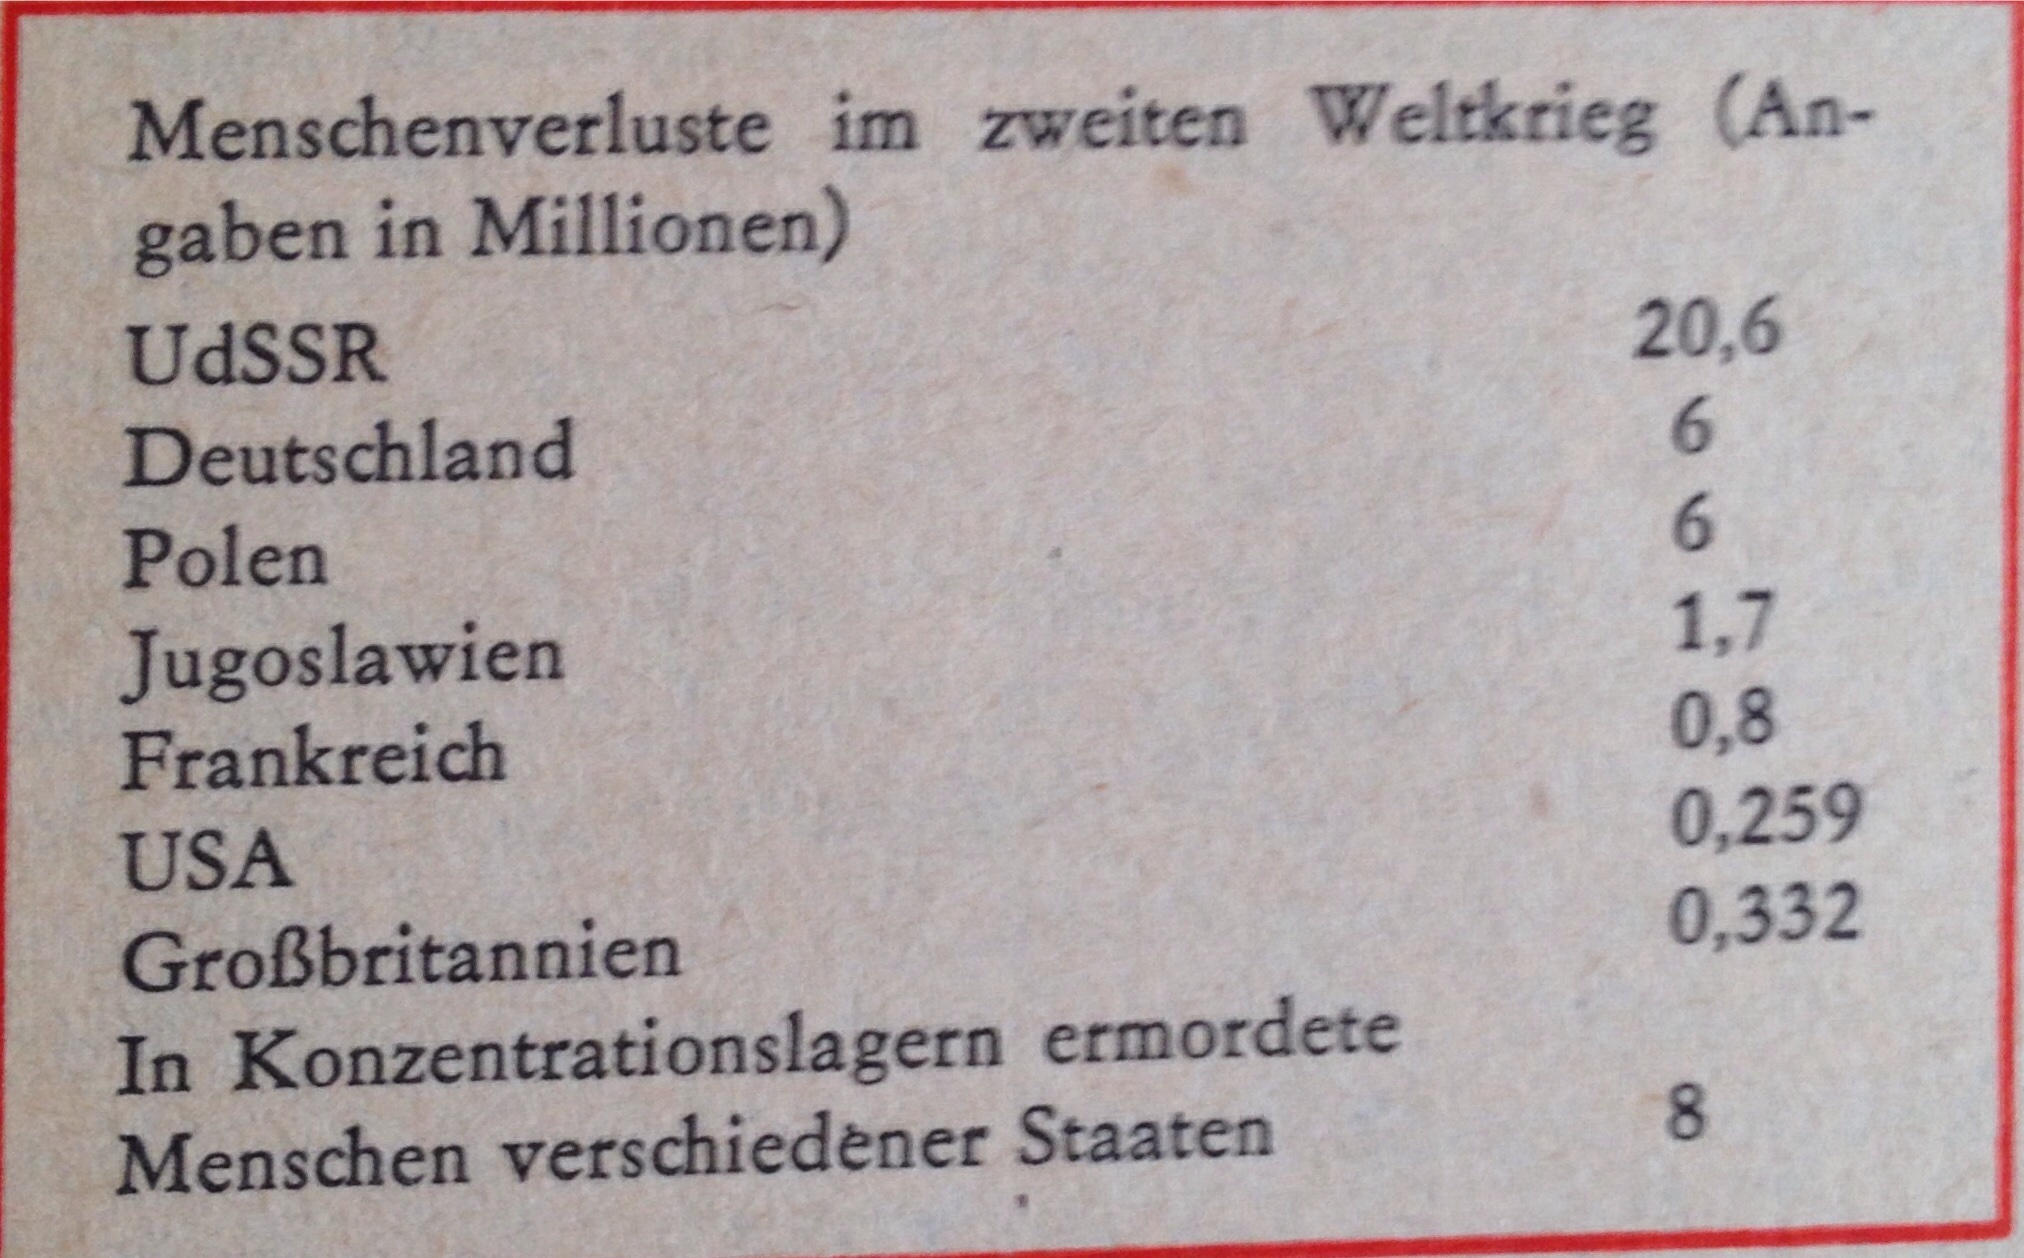 Ergebnisse des II. Weltkrieges